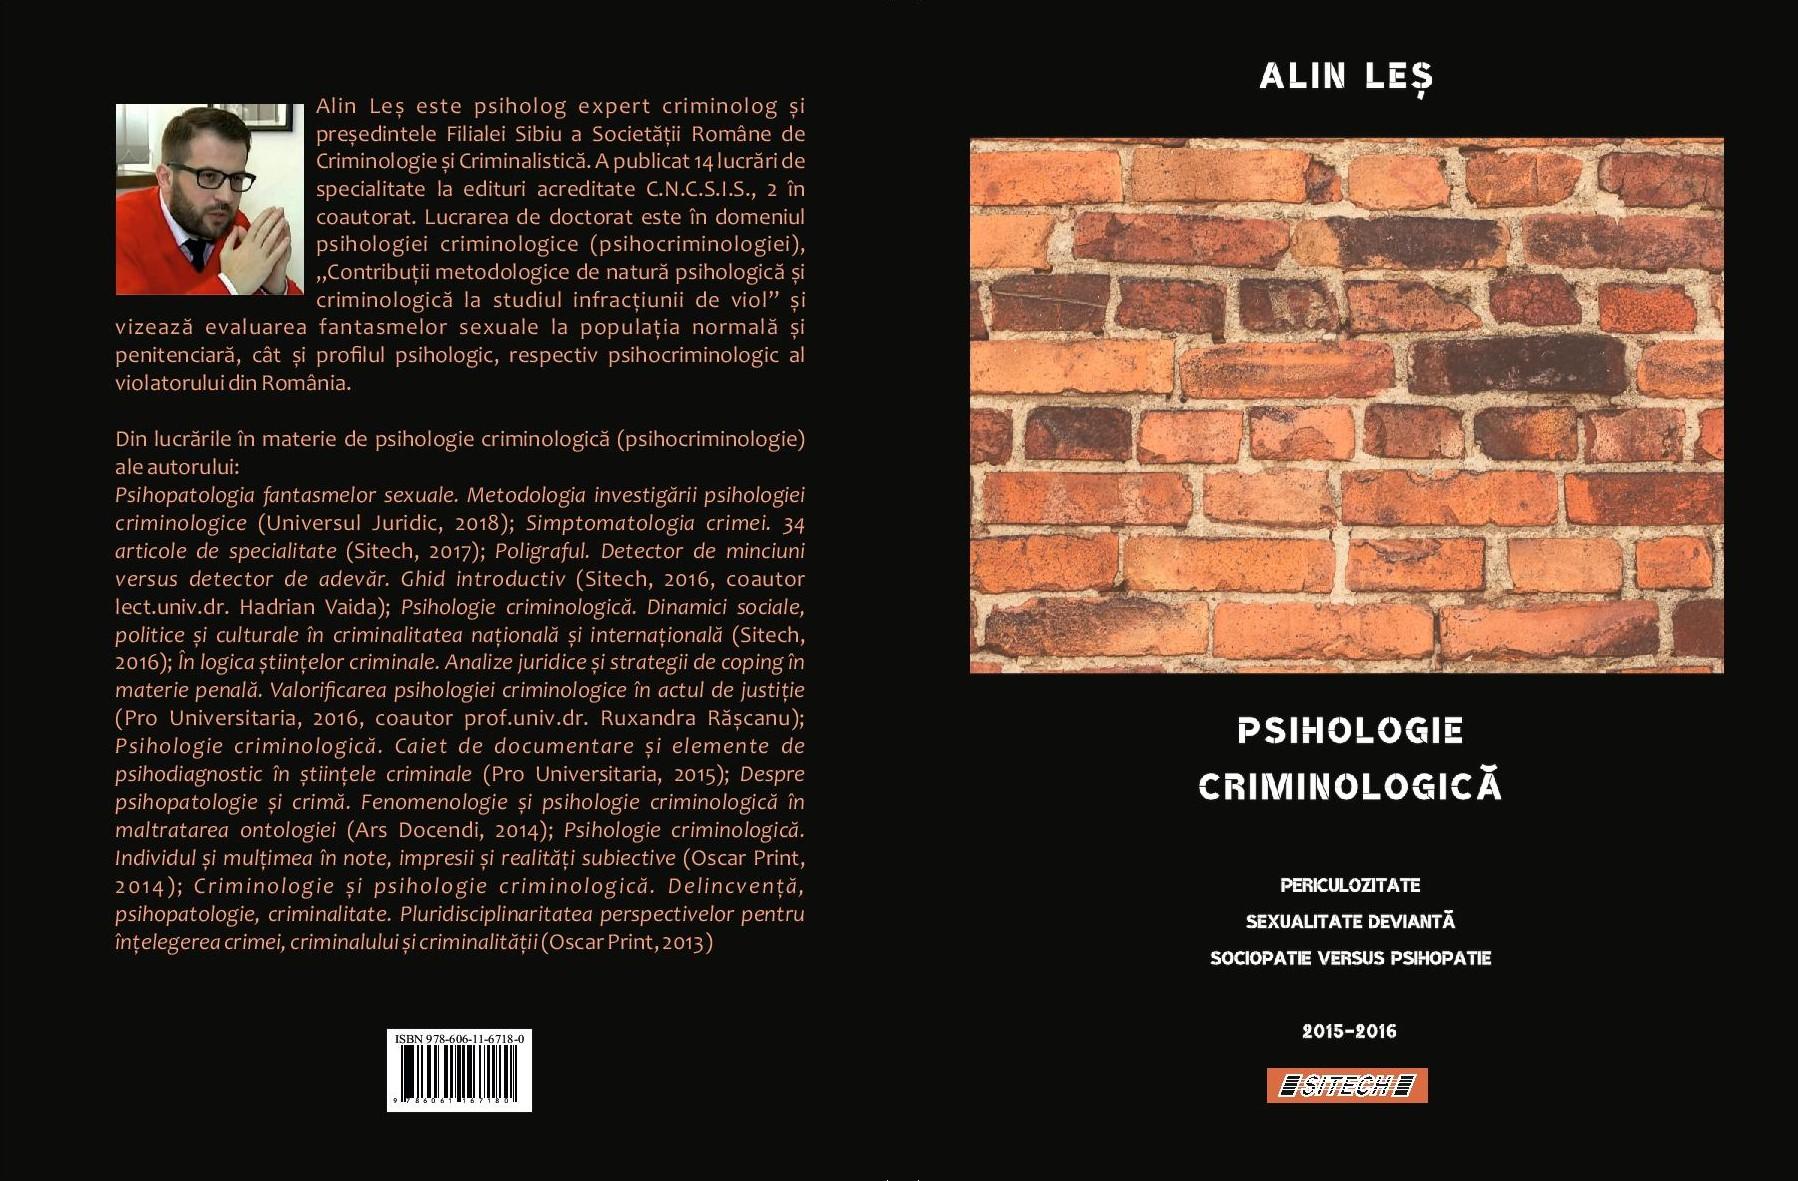 Alin Les_PSIHOLOGIE CRIMINOLOGICA_Coperta A5 (1)-page-001